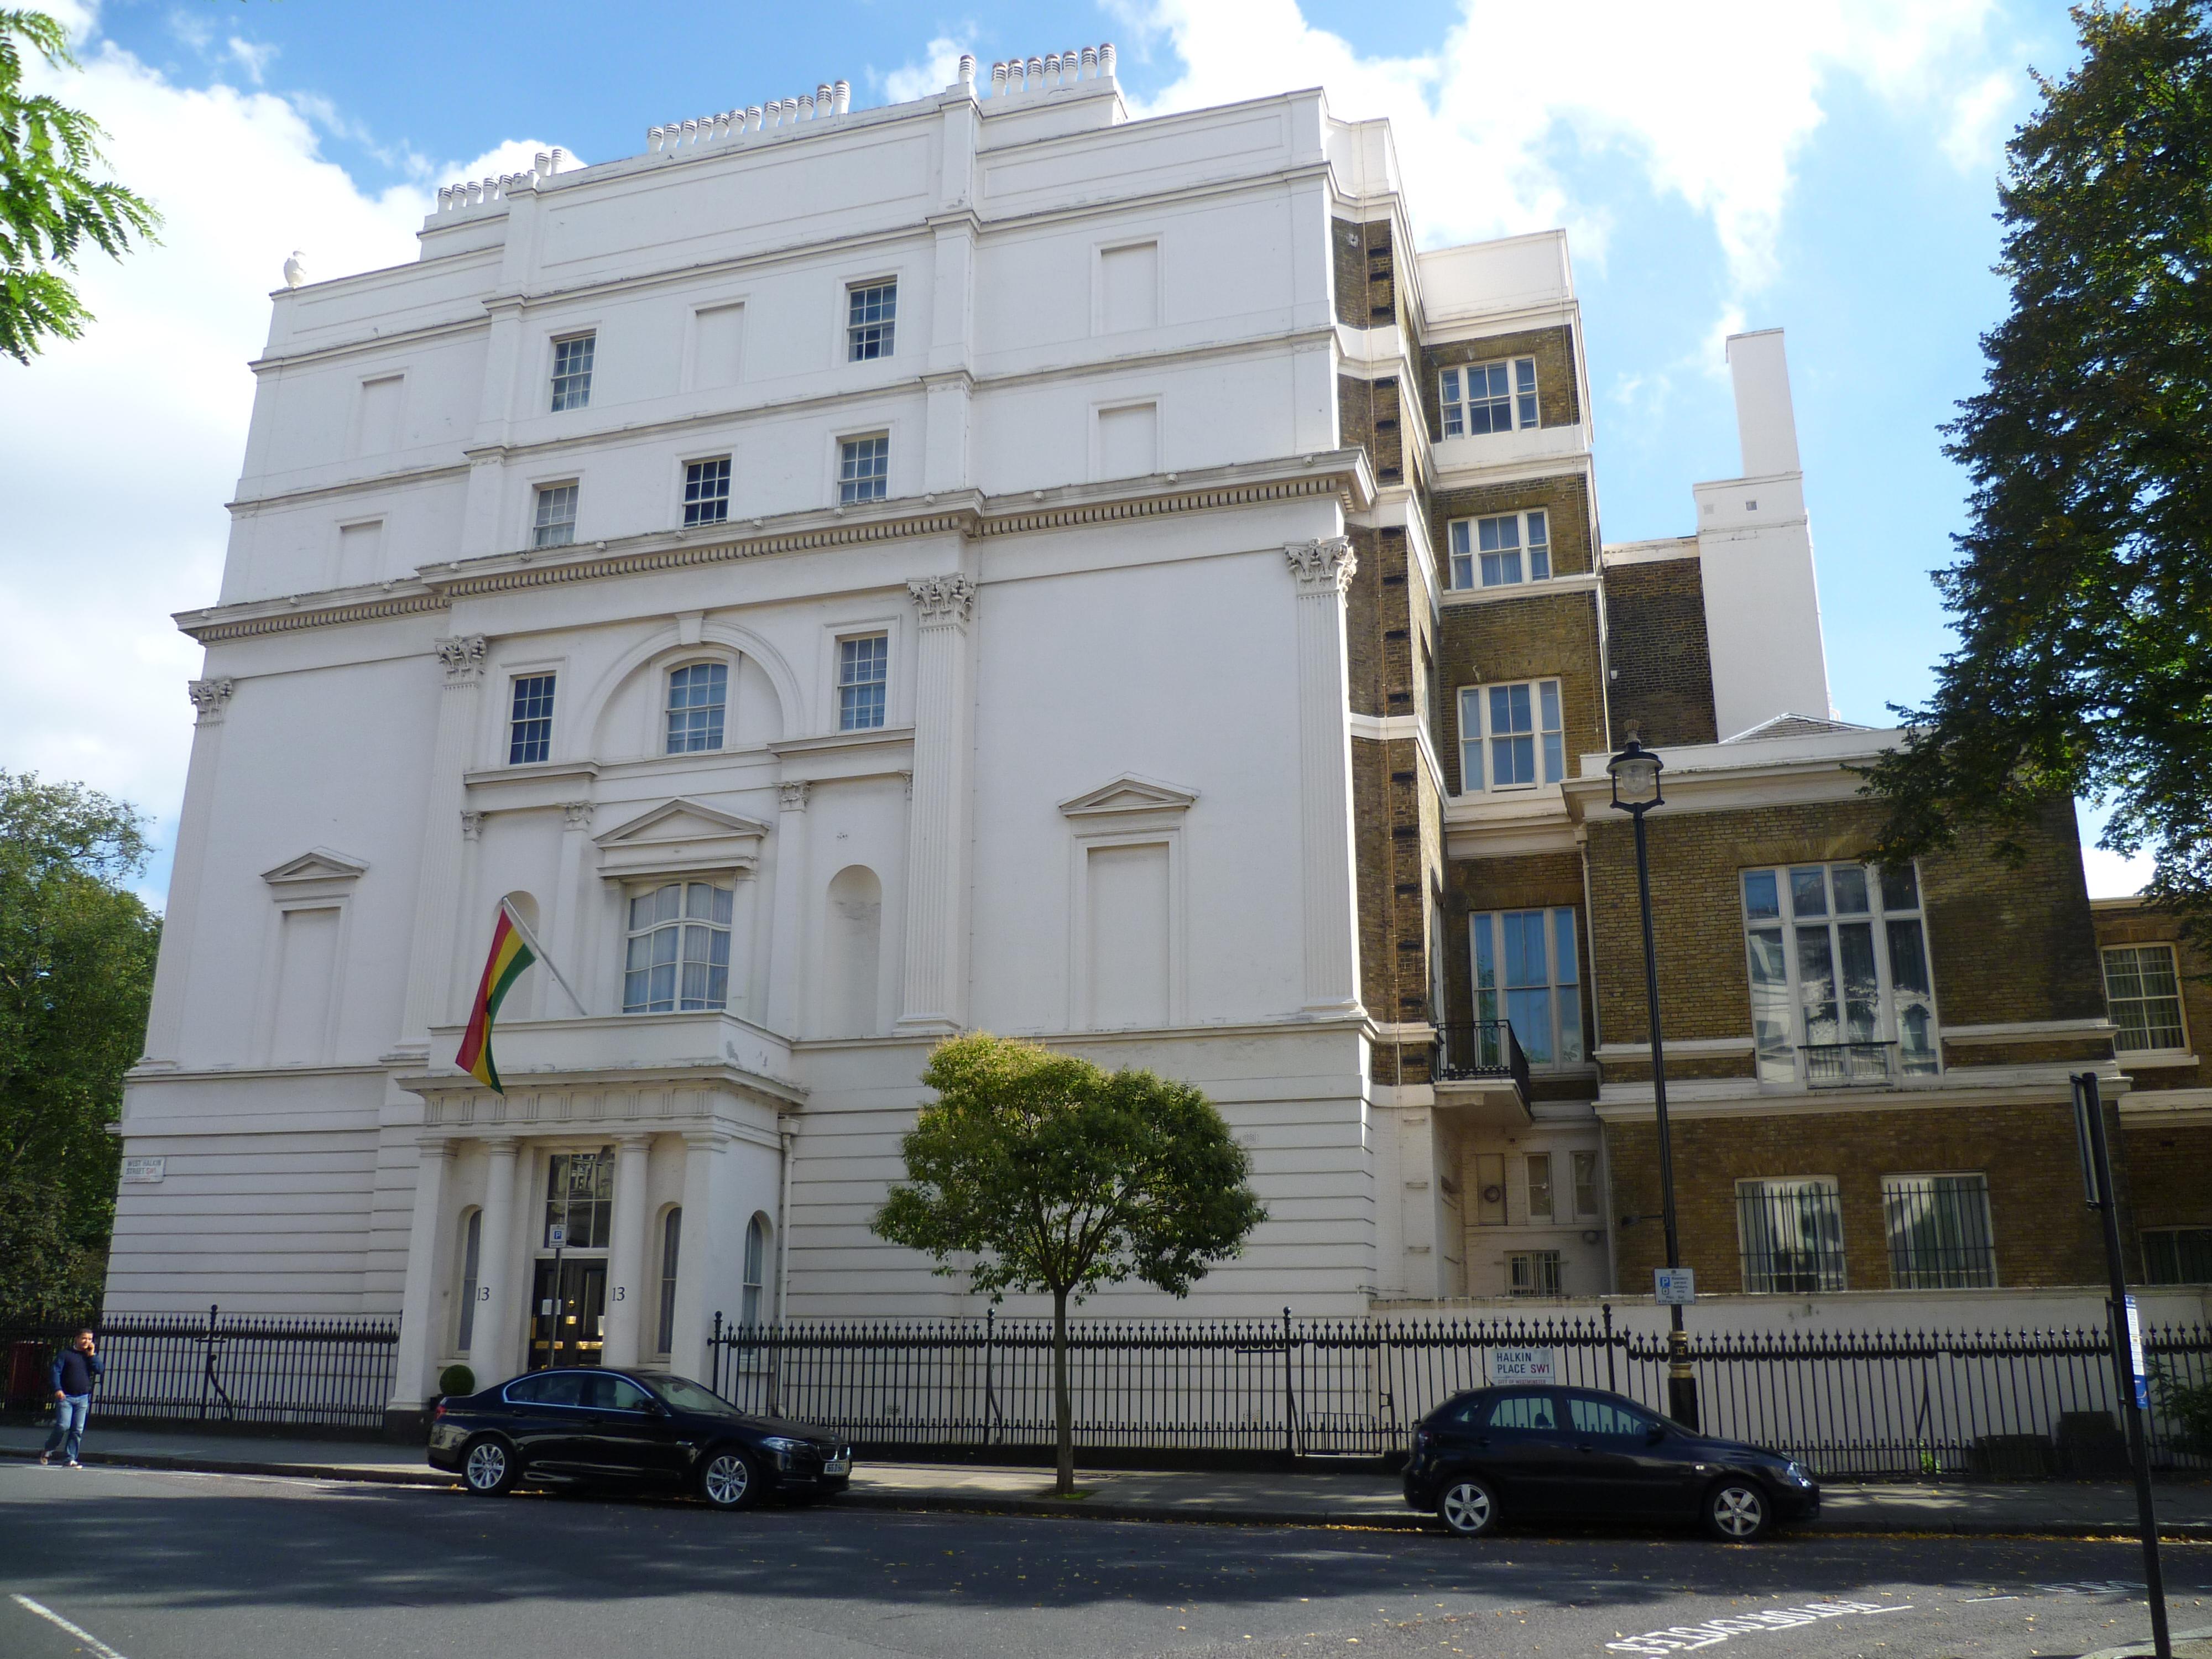 Google Hoofdkwartier Londen : Bestand:ghana high commission london .jpg wikipedia